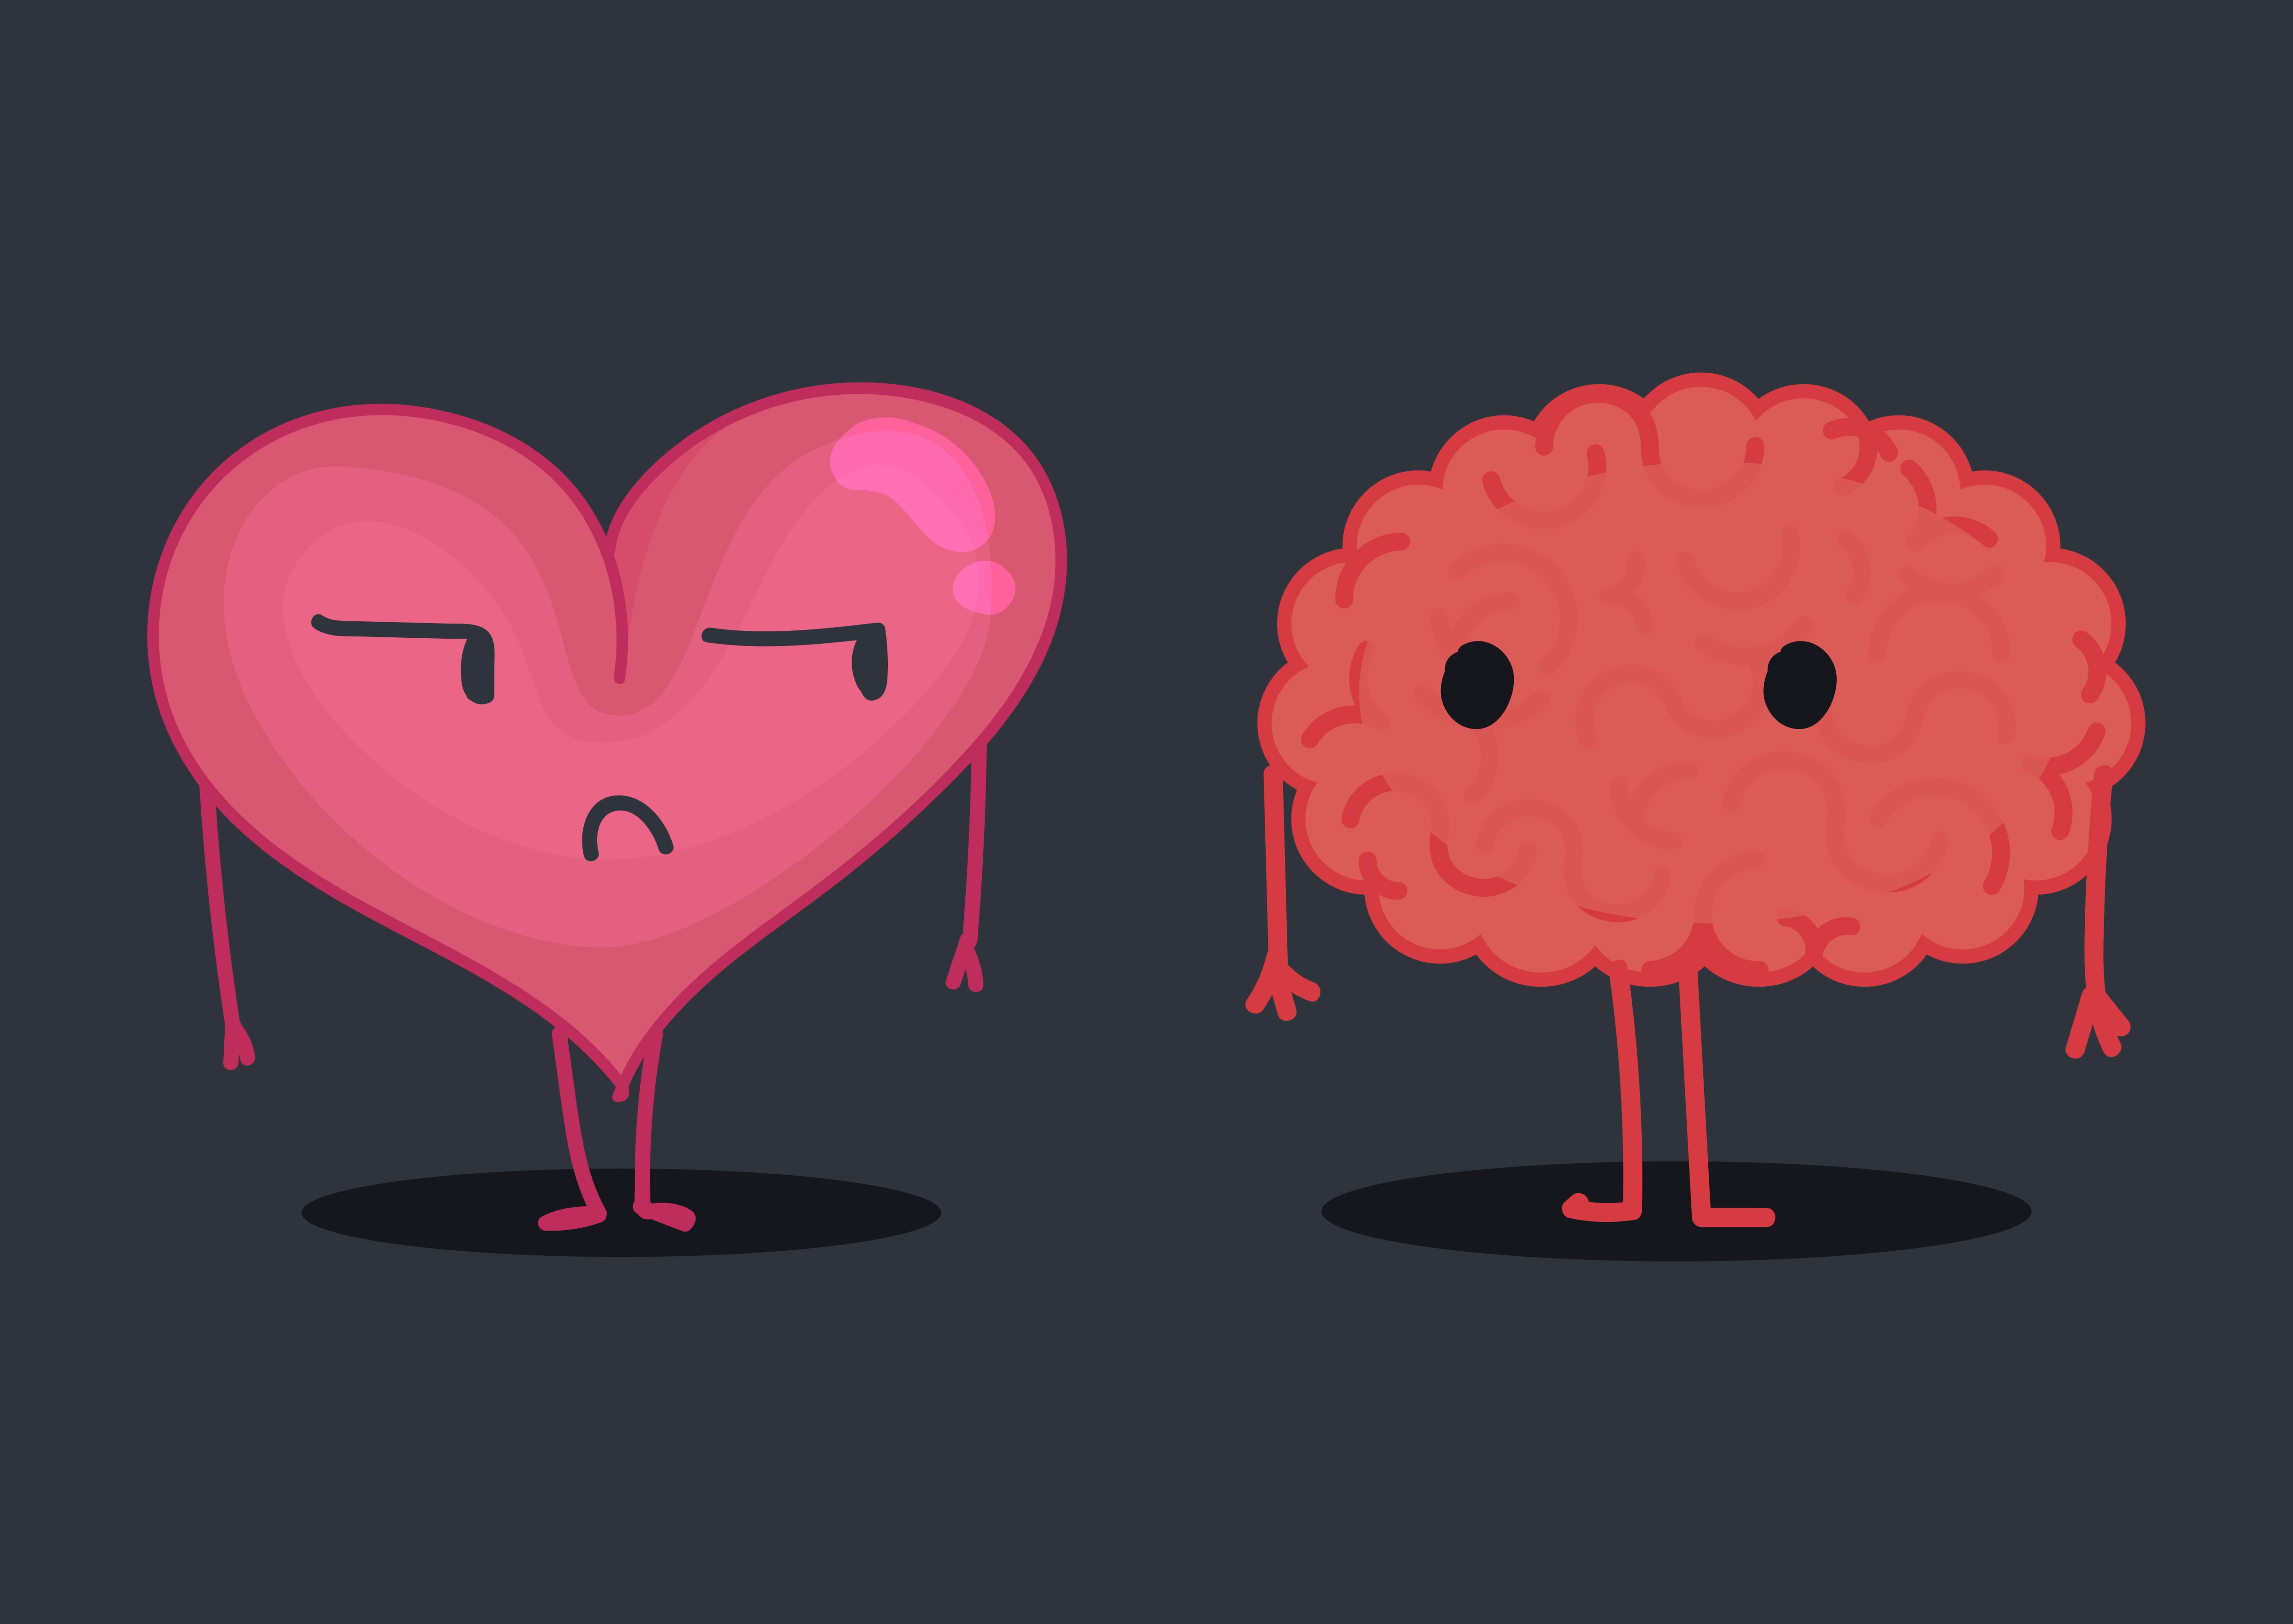 Brain & heart character illustration